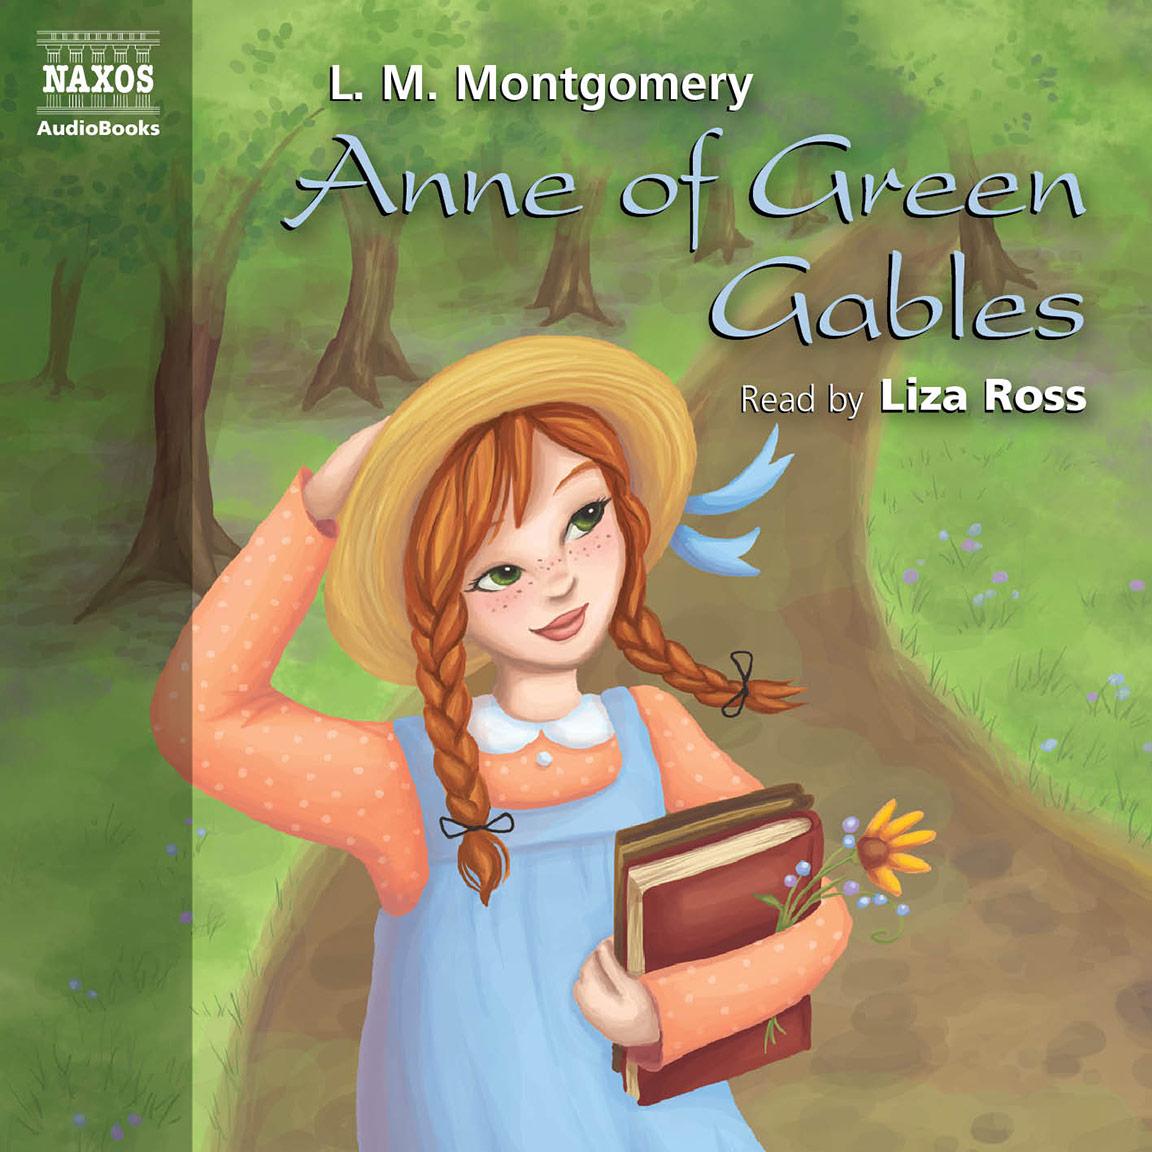 Anne of Green Gables (abridged)